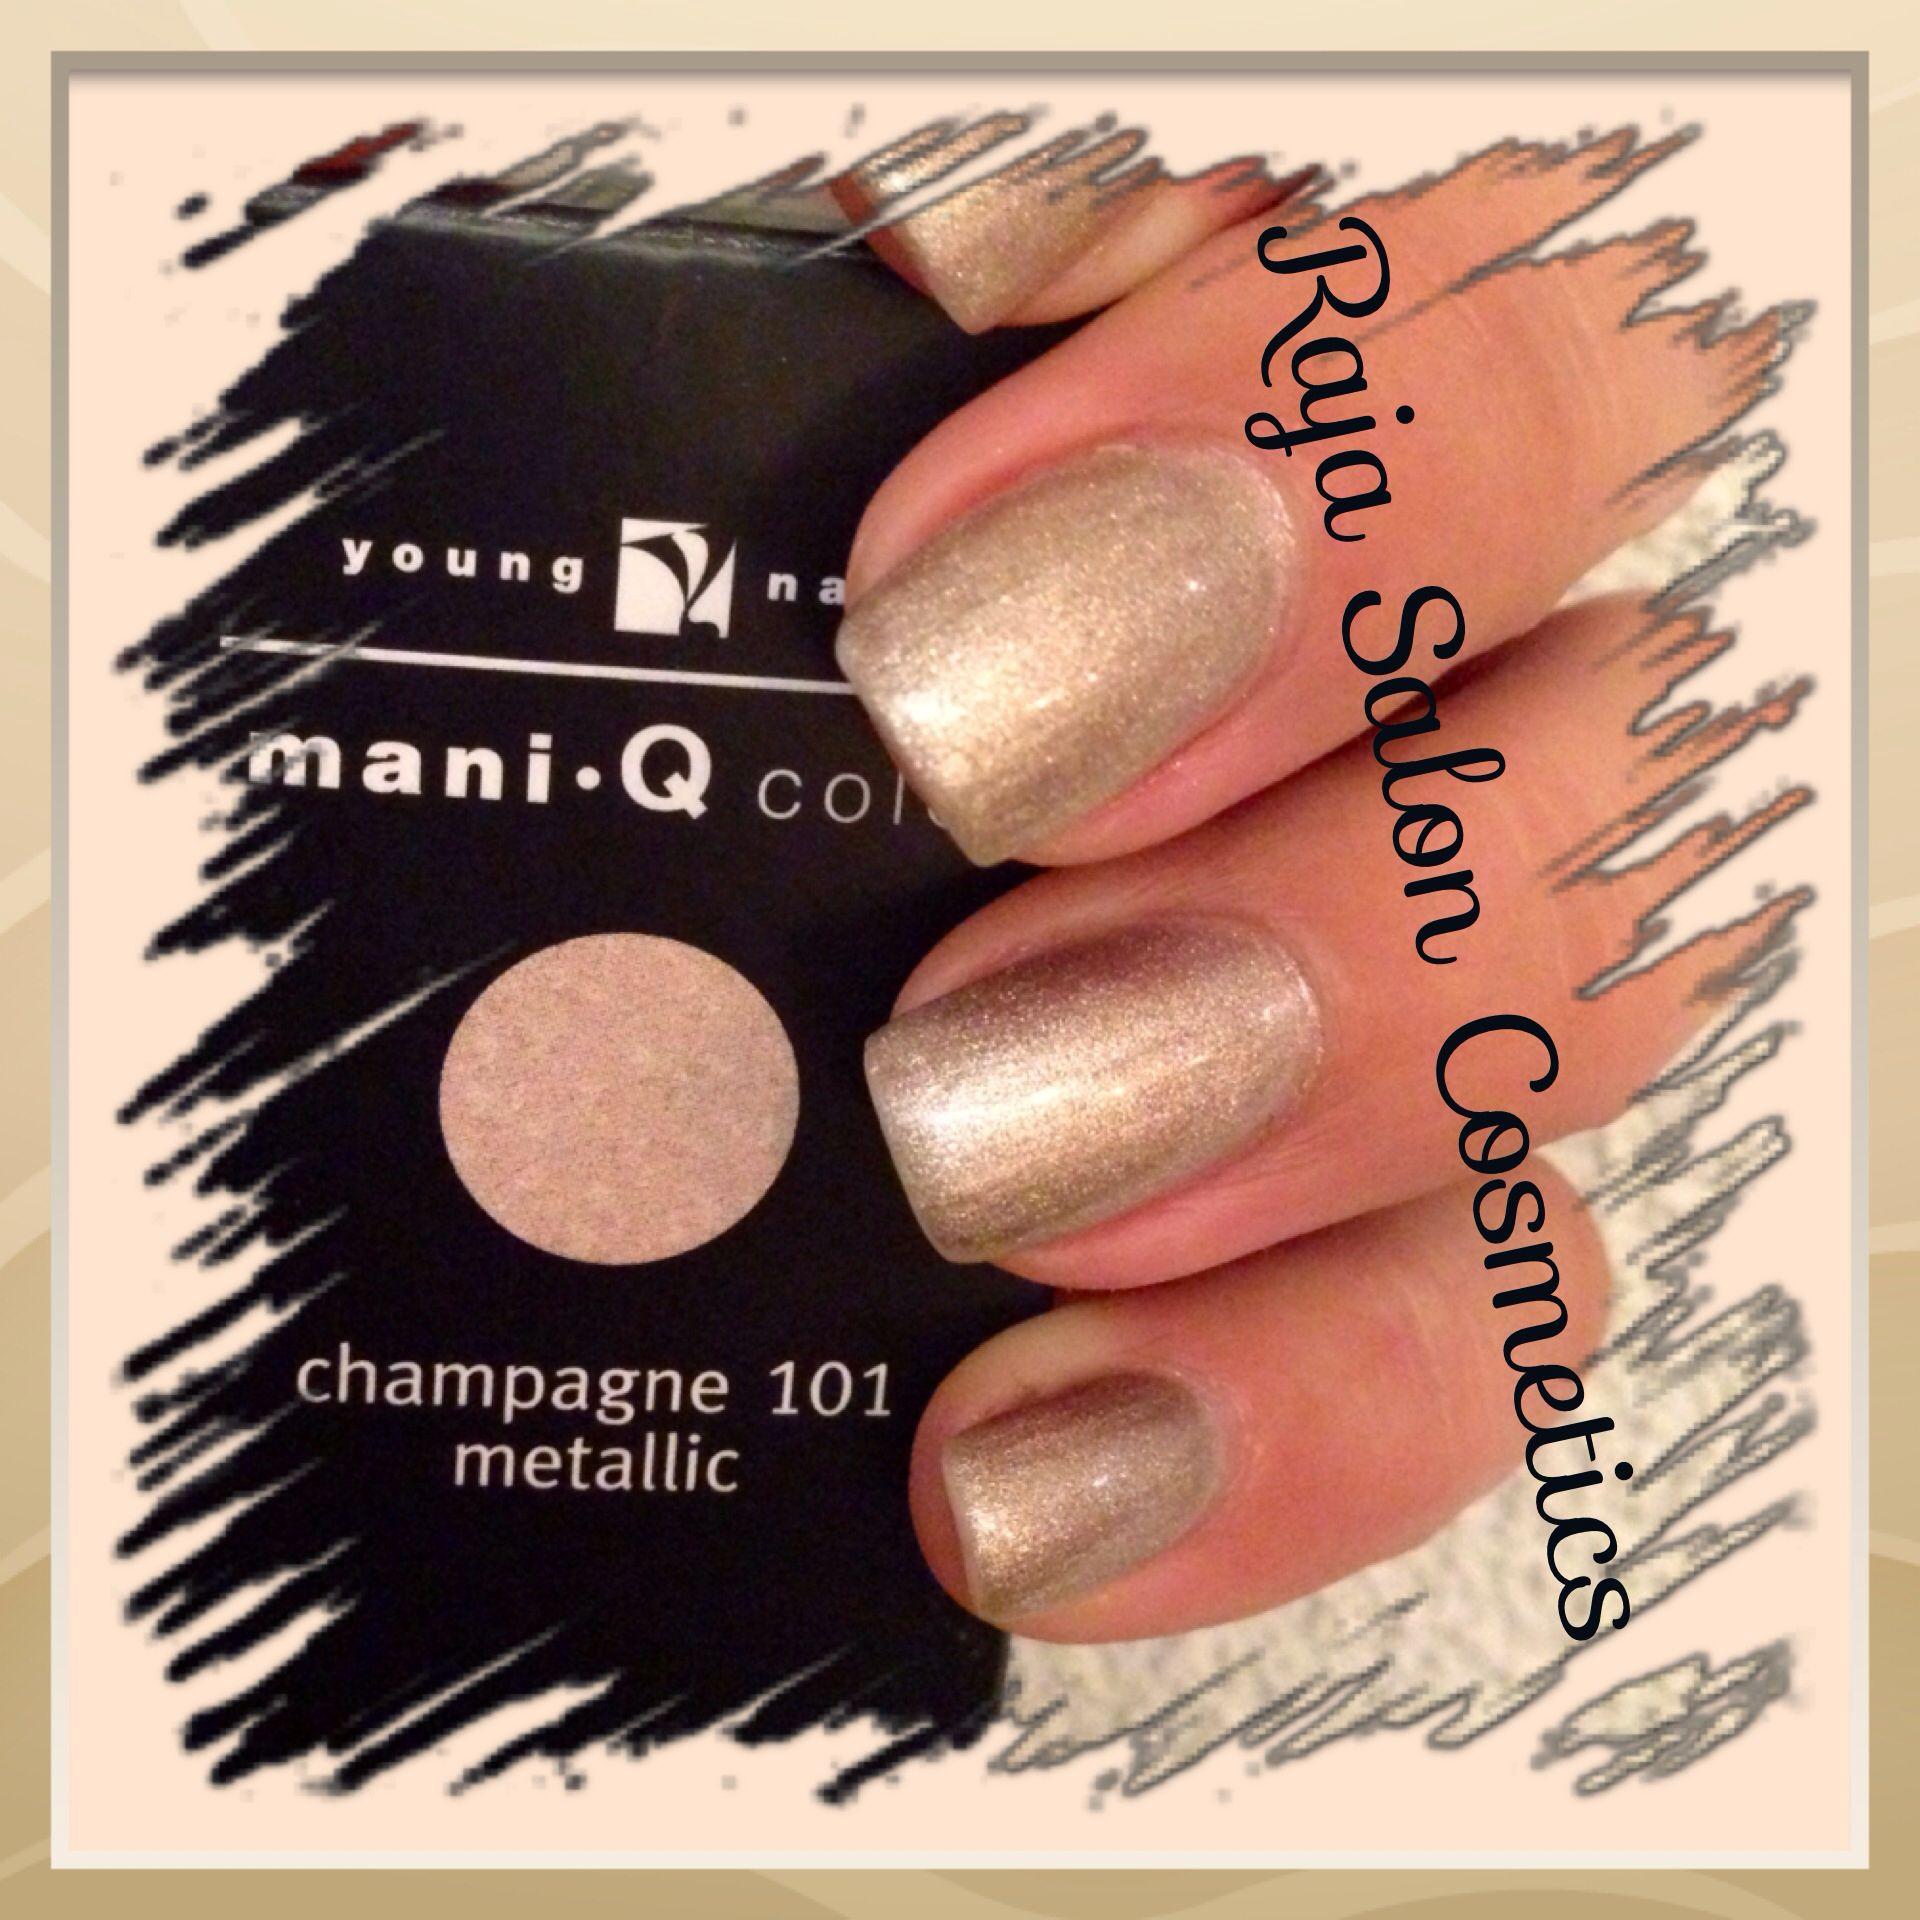 Young Nails Mani-Q color Champagne 101 Www.raja-saloncosmetics.nl ...